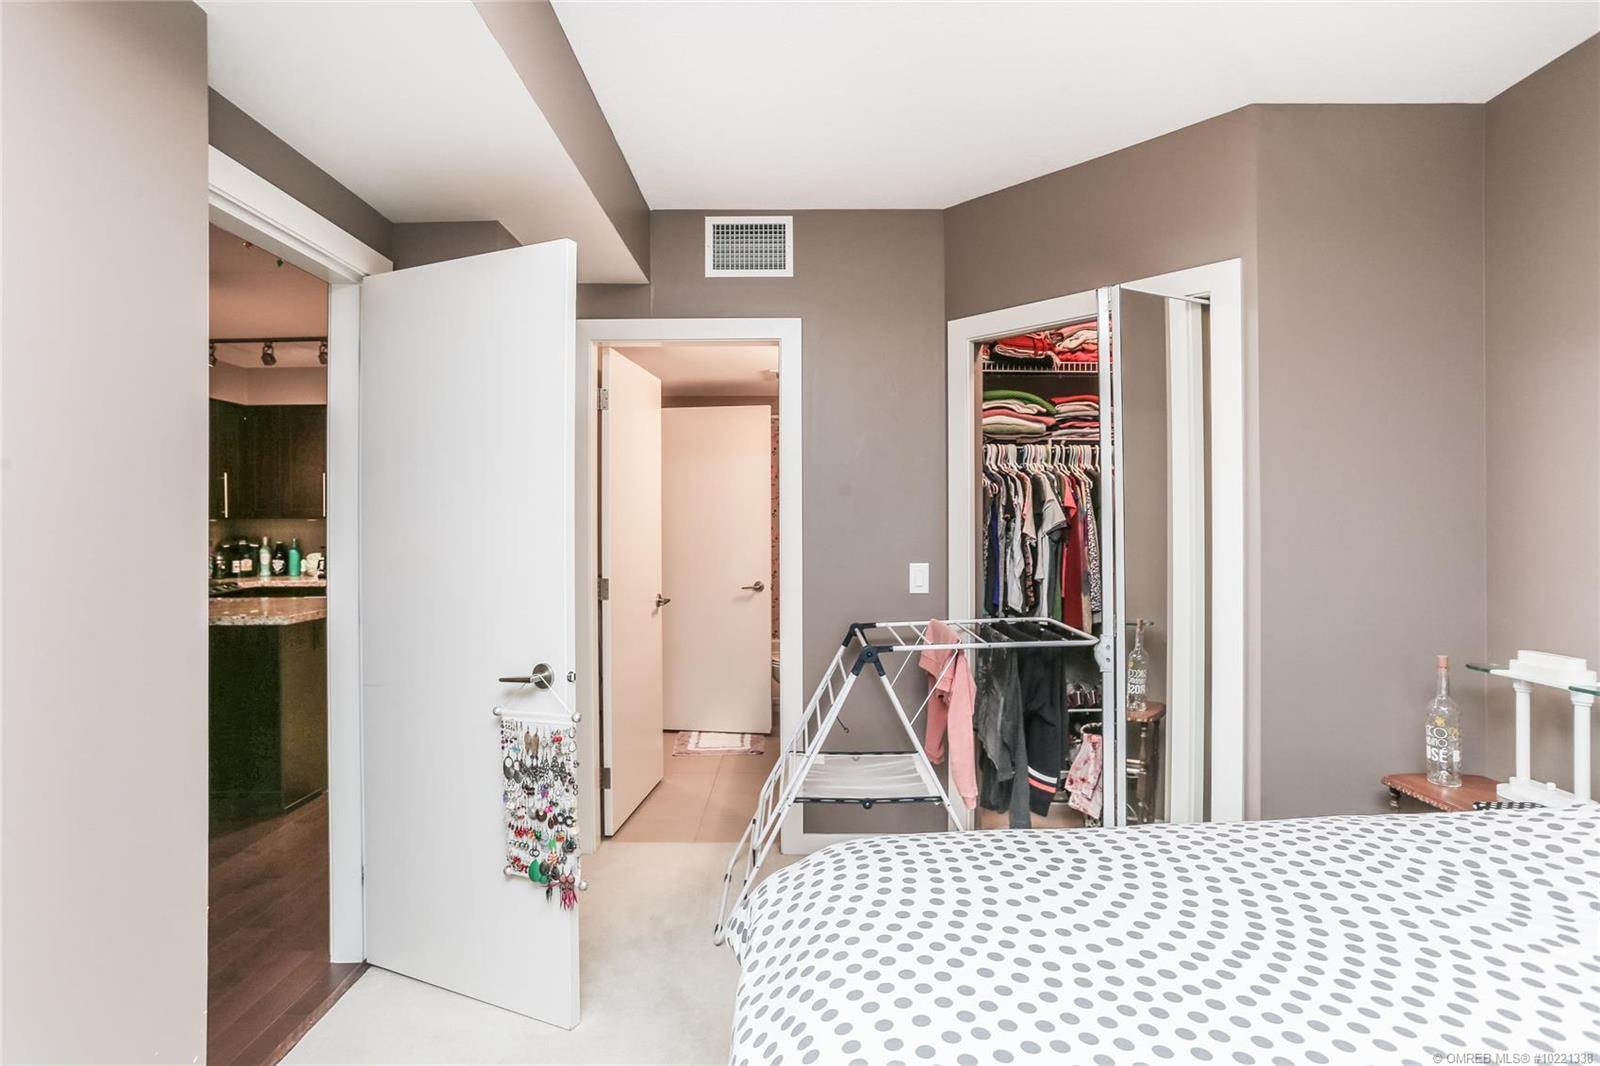 #404 1075 Sunset Drive, - Kelowna Apartment for sale, 1 Bedroom (10221338) - #11